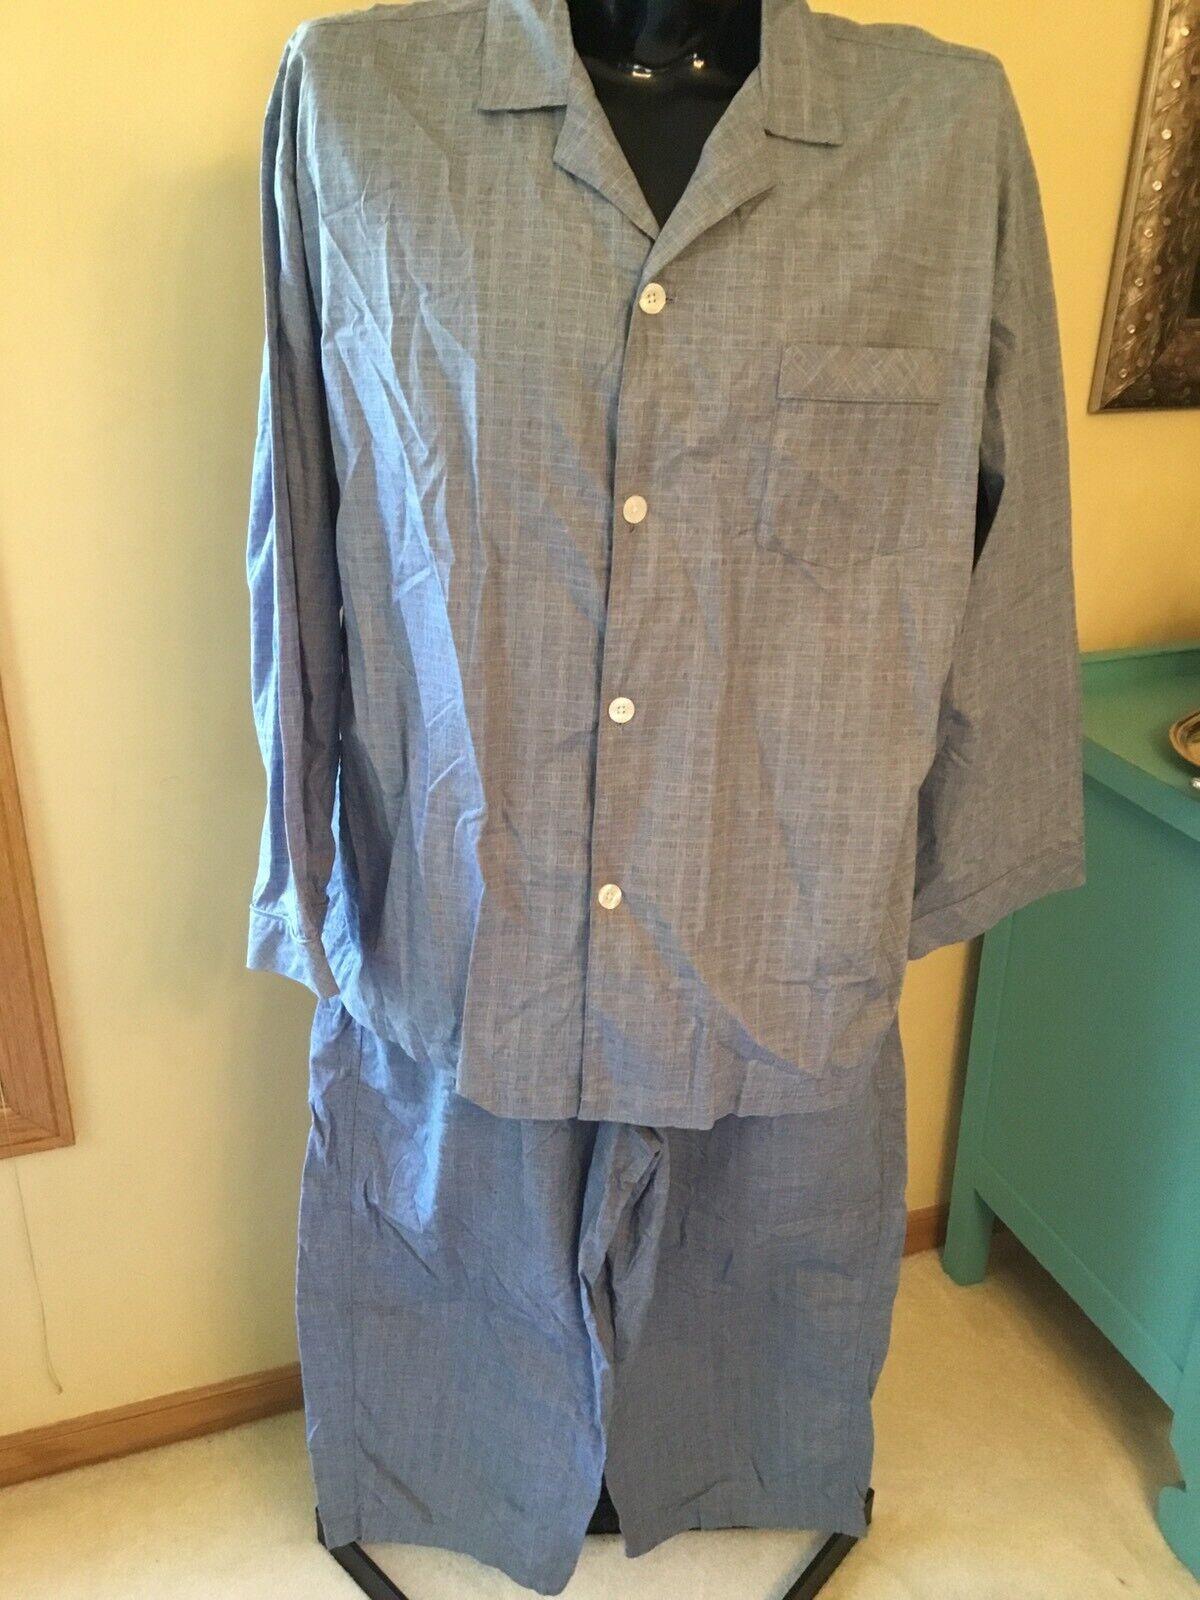 Roundtree & Yorke Sleepwear Mens Pajamas Set Size XL Top Pants Navy Plaid